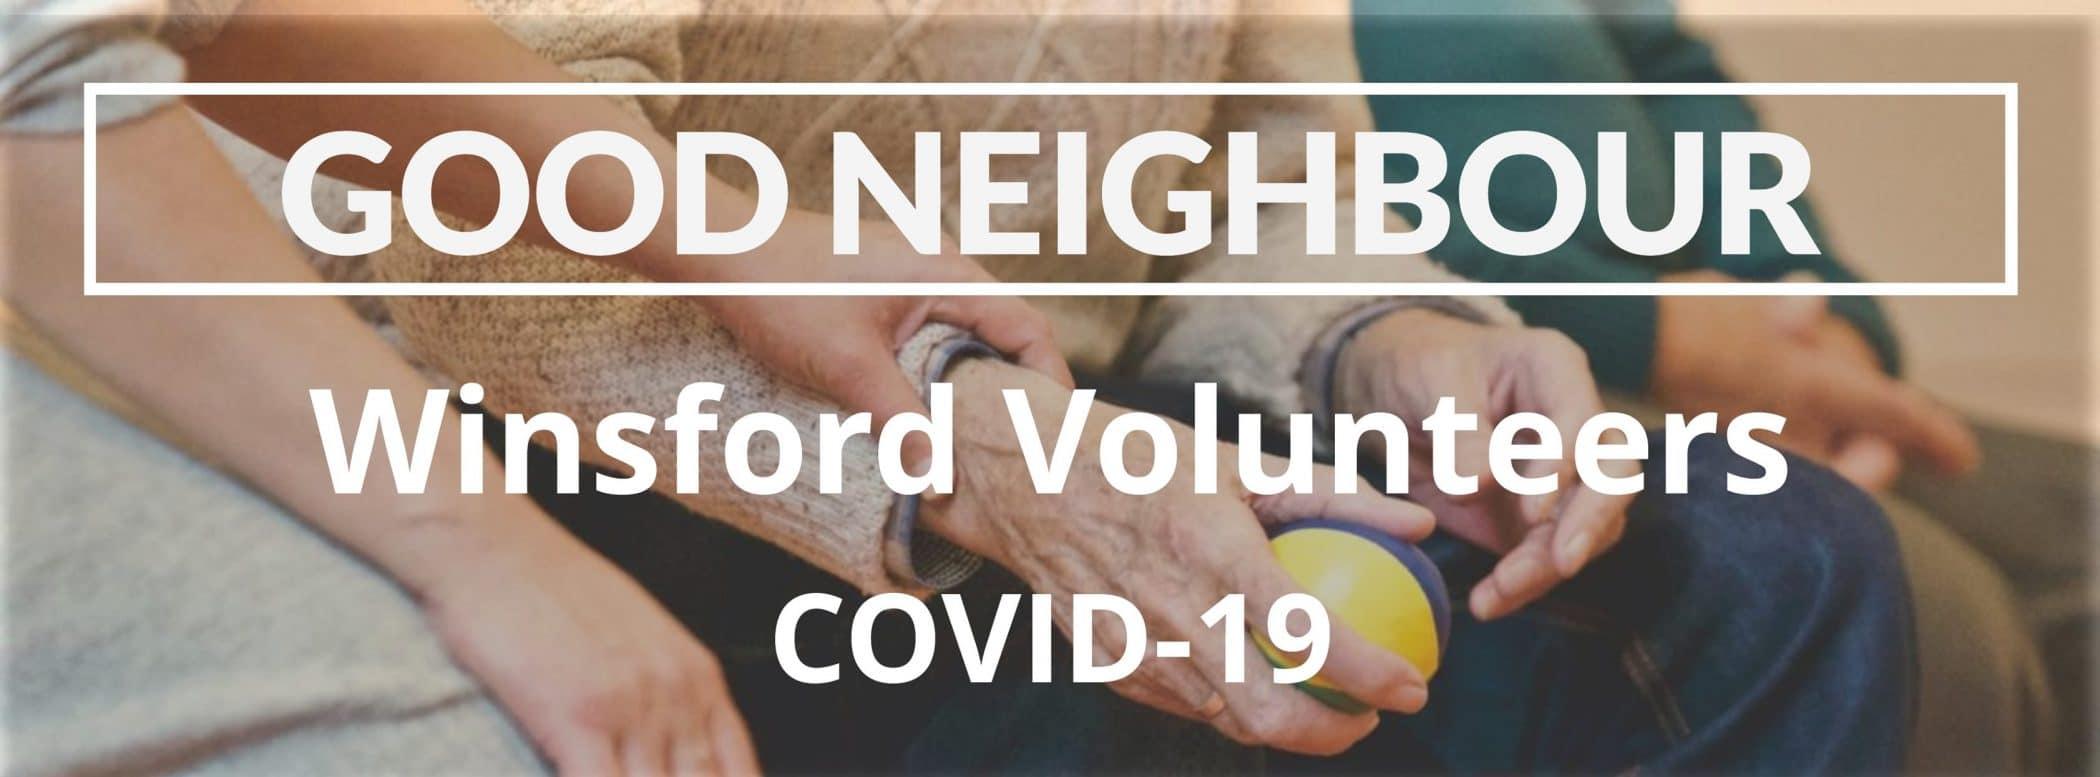 Good Neighbour Winsford Volunteers Covid-19